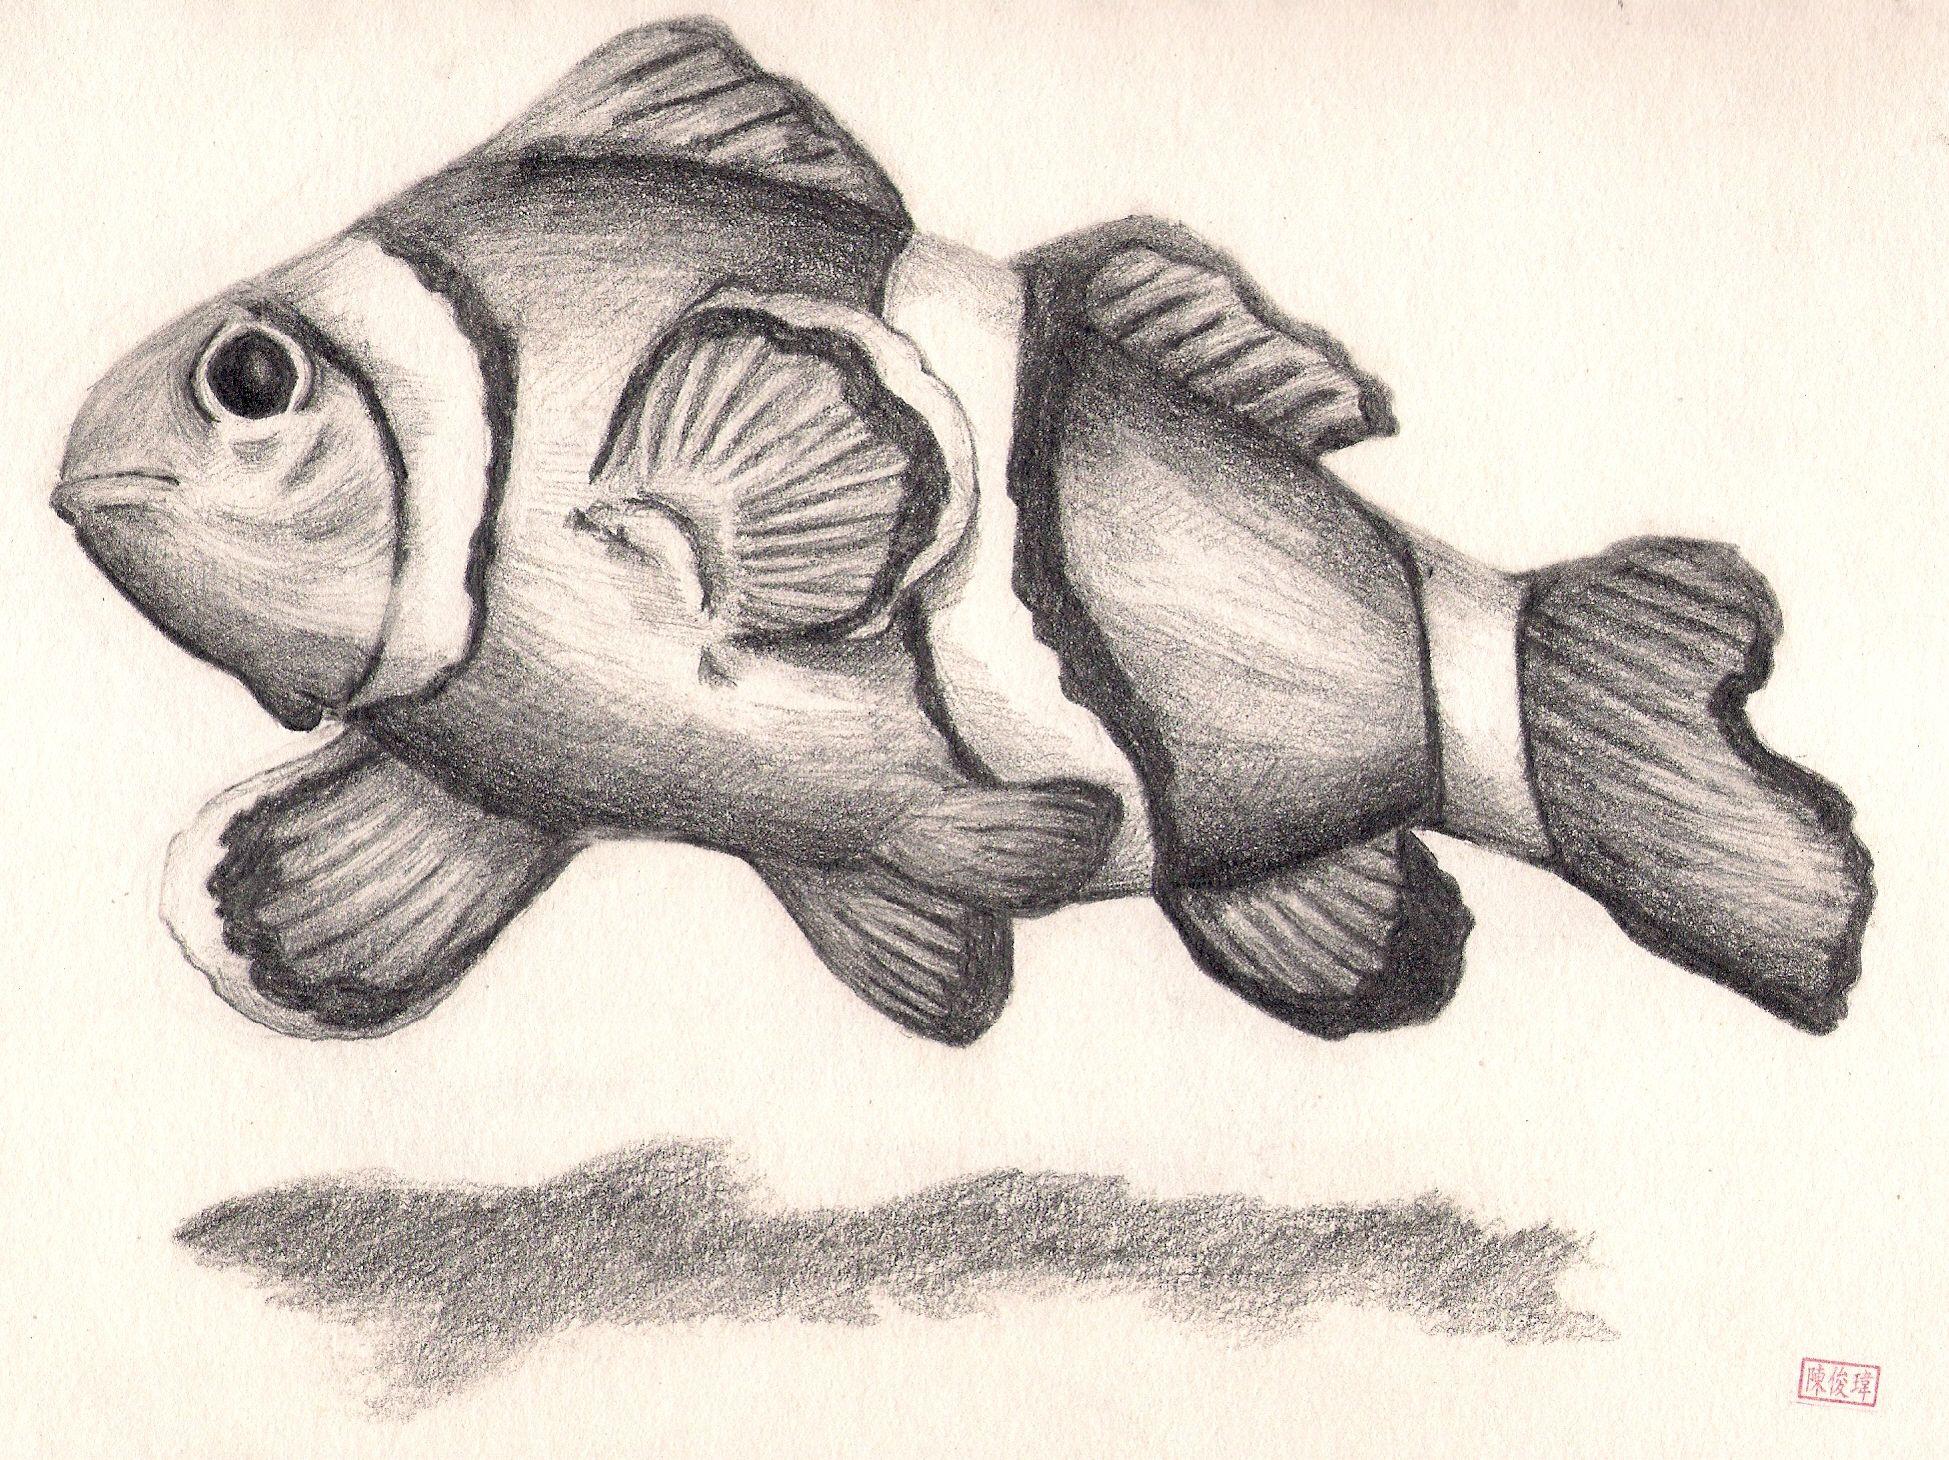 Clownfish couple drawings fish drawings horse drawings pencil drawings basic sketching